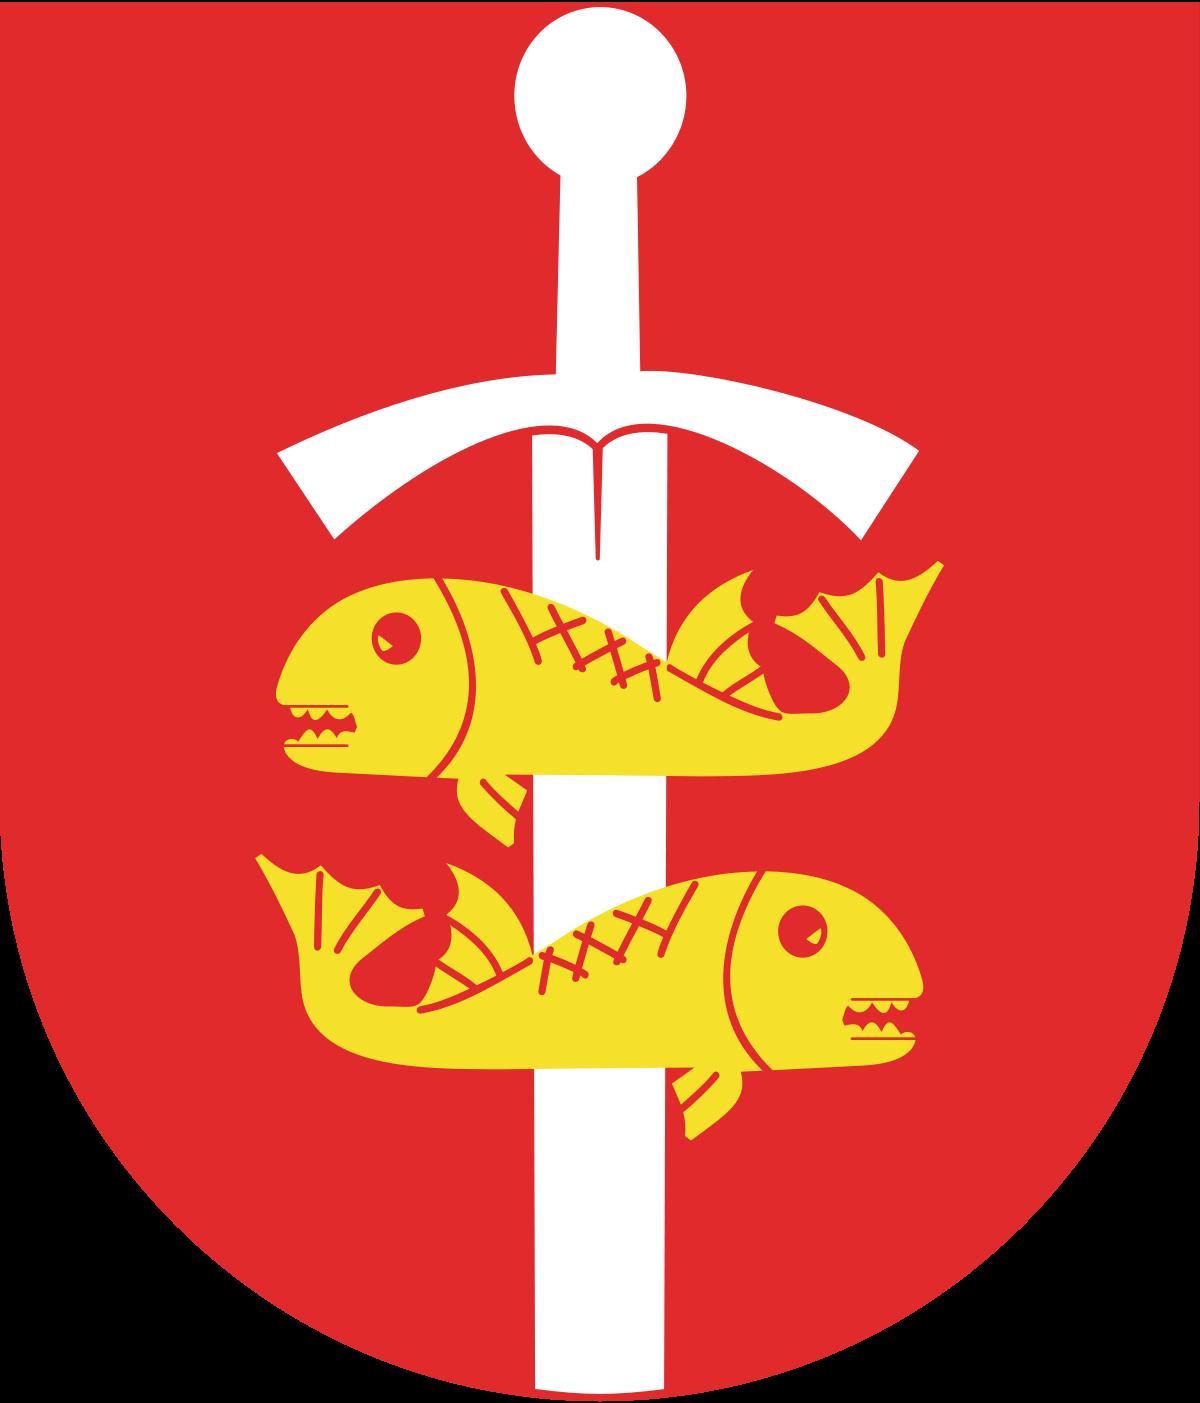 Herb miasta Gdynia